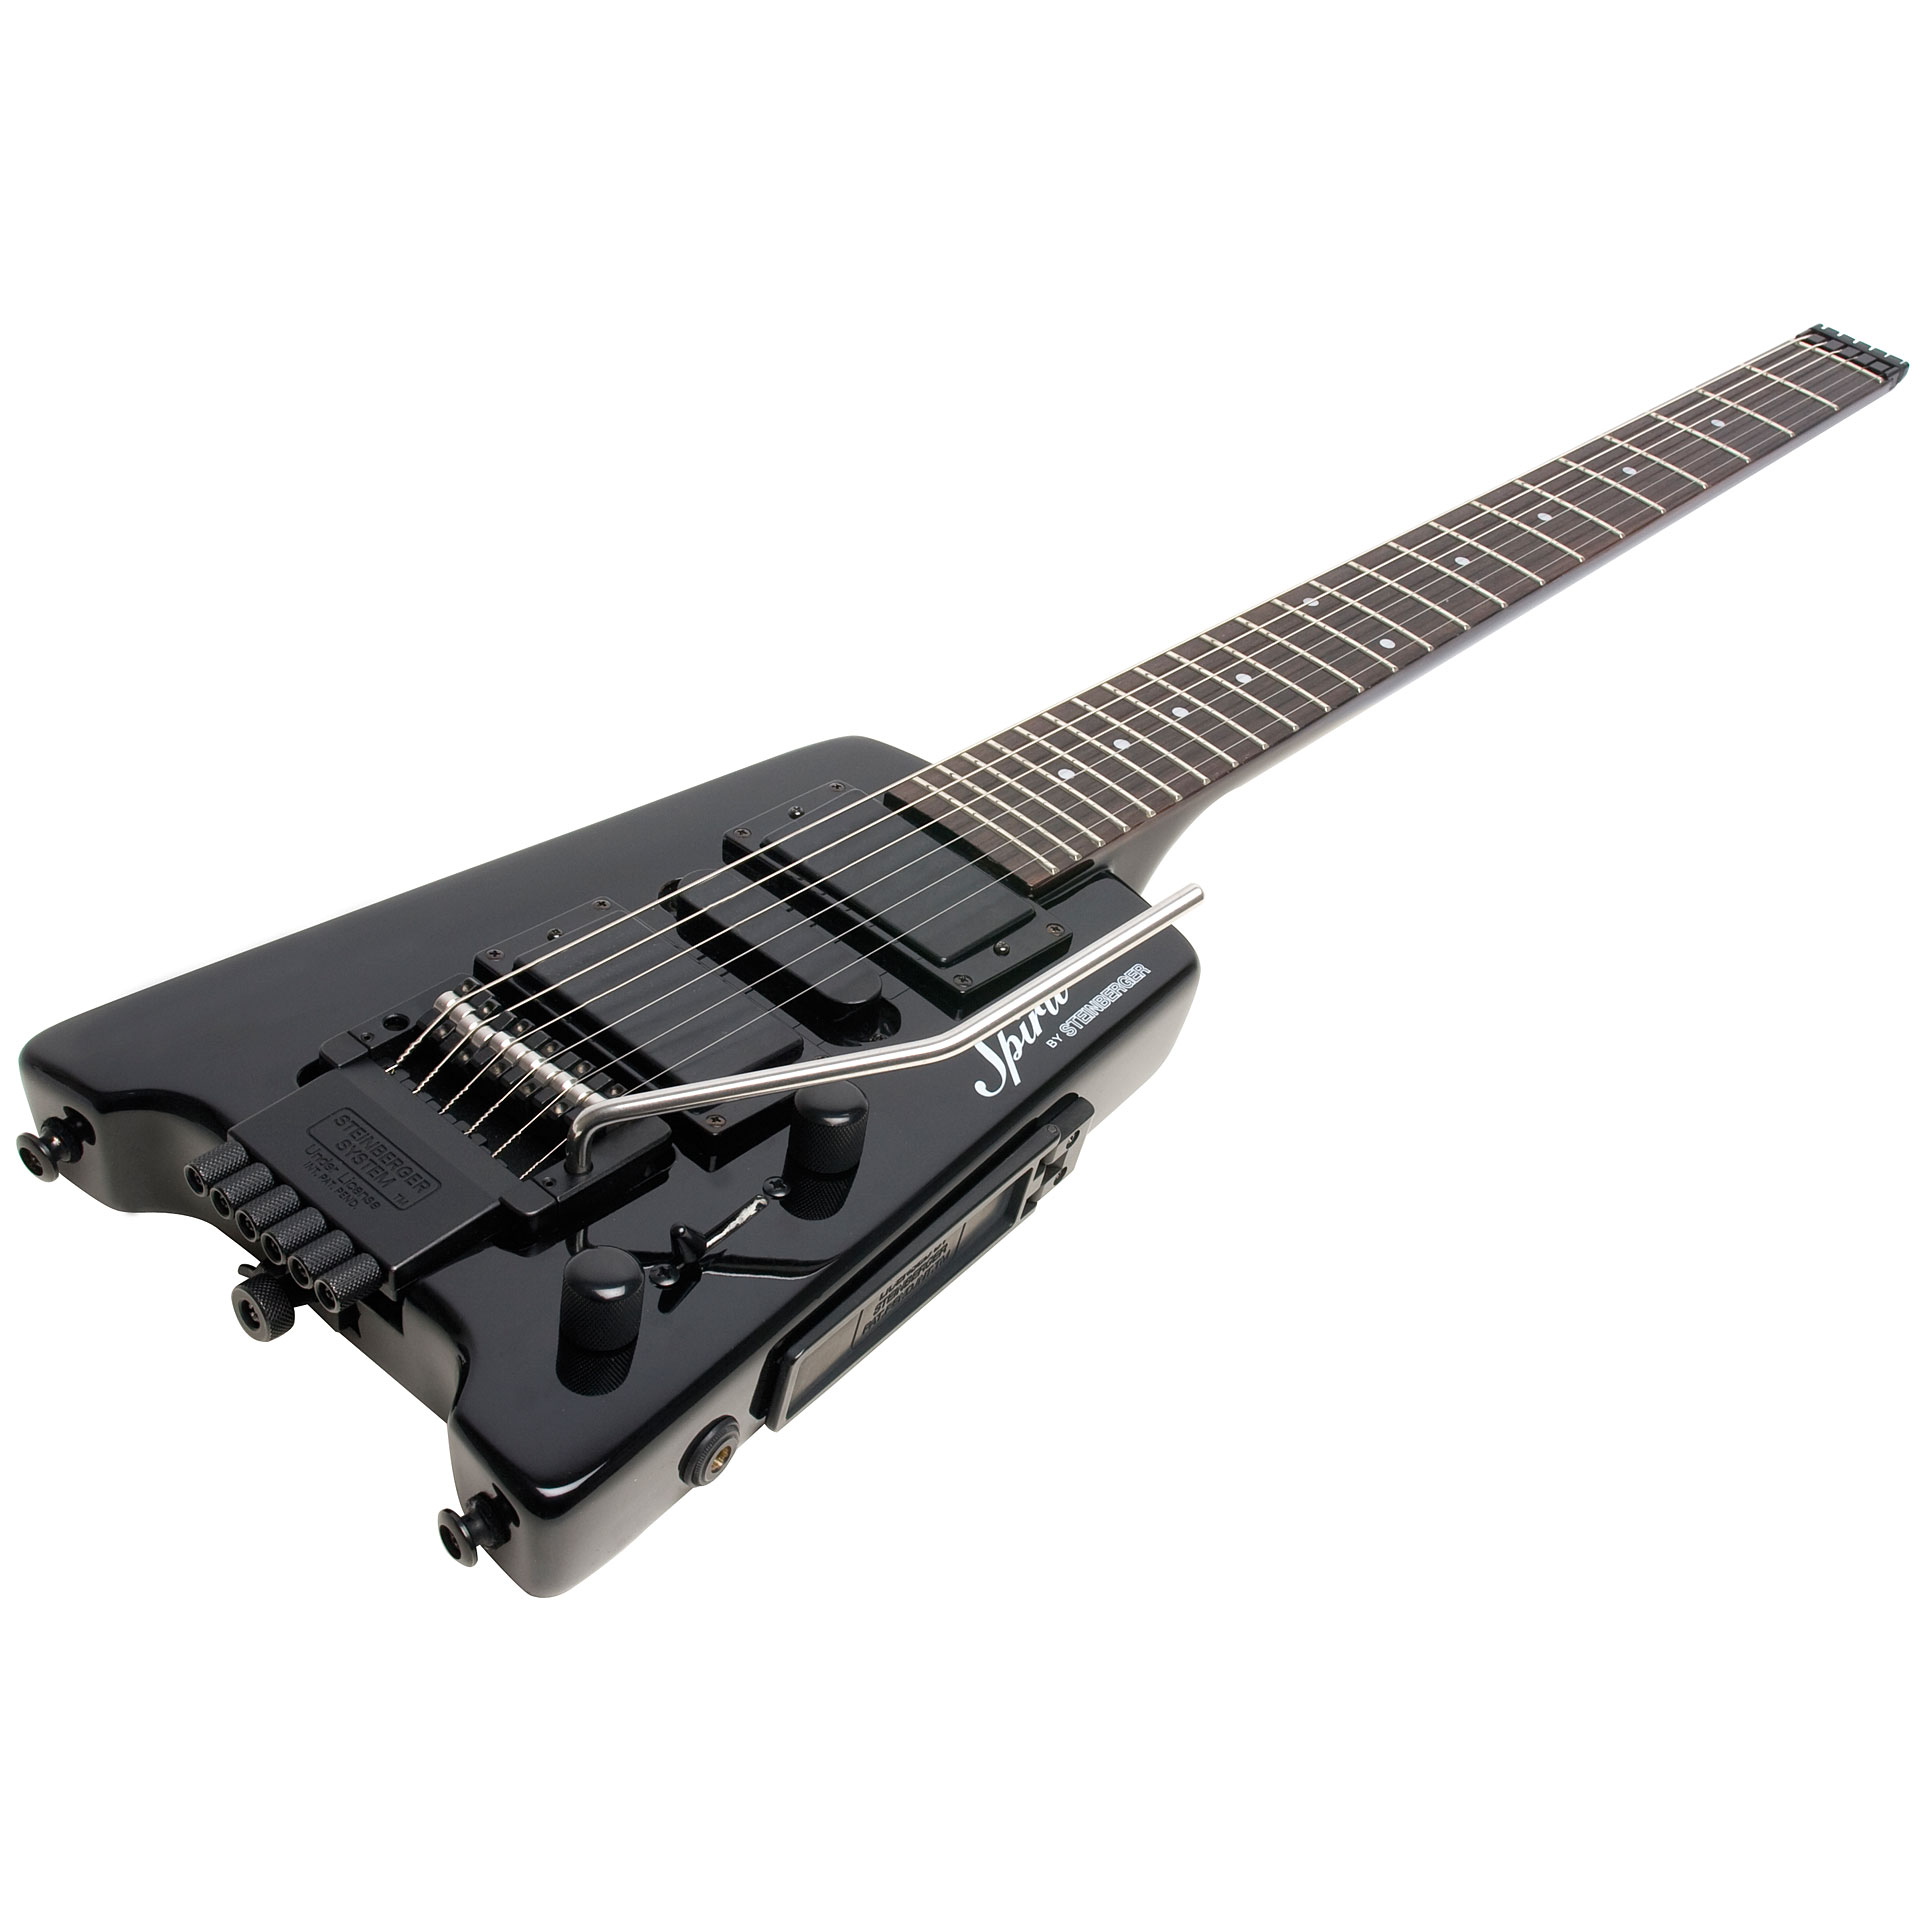 Steinberger Spirit Gt Pro Deluxe Bk 171 Electric Guitar